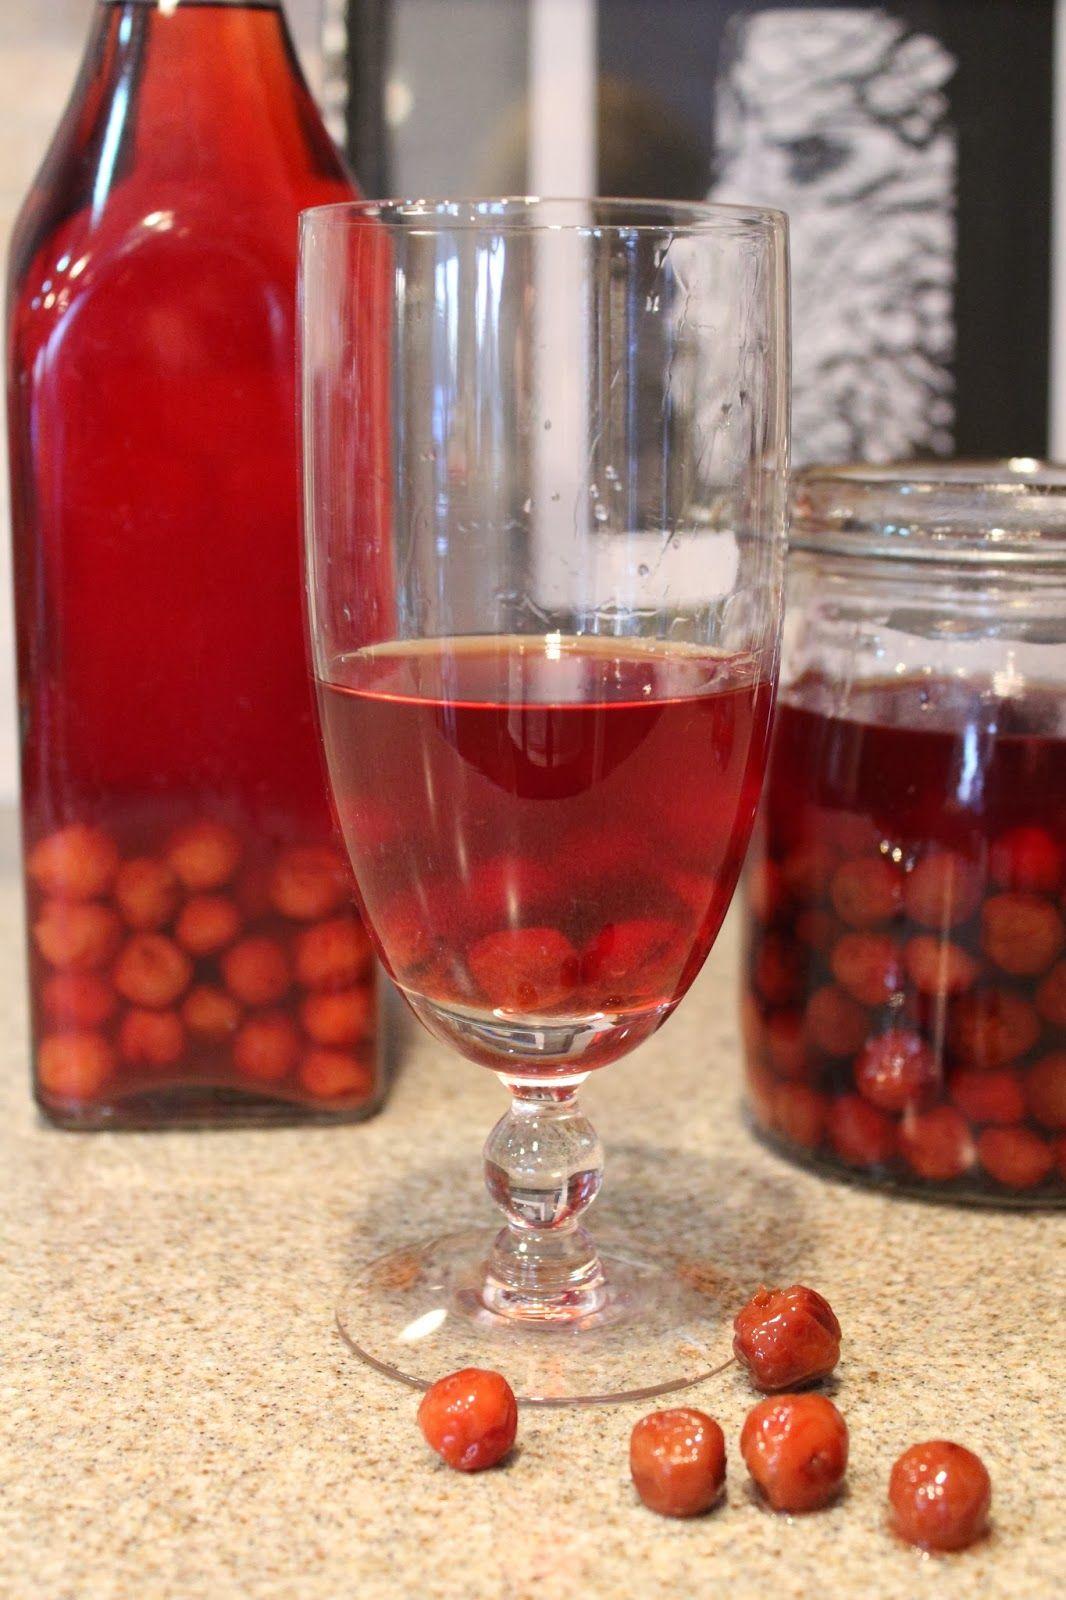 Cherry Brandy Visinata Cherry Brandy Cherry Liquor Recipe Liquor Recipes